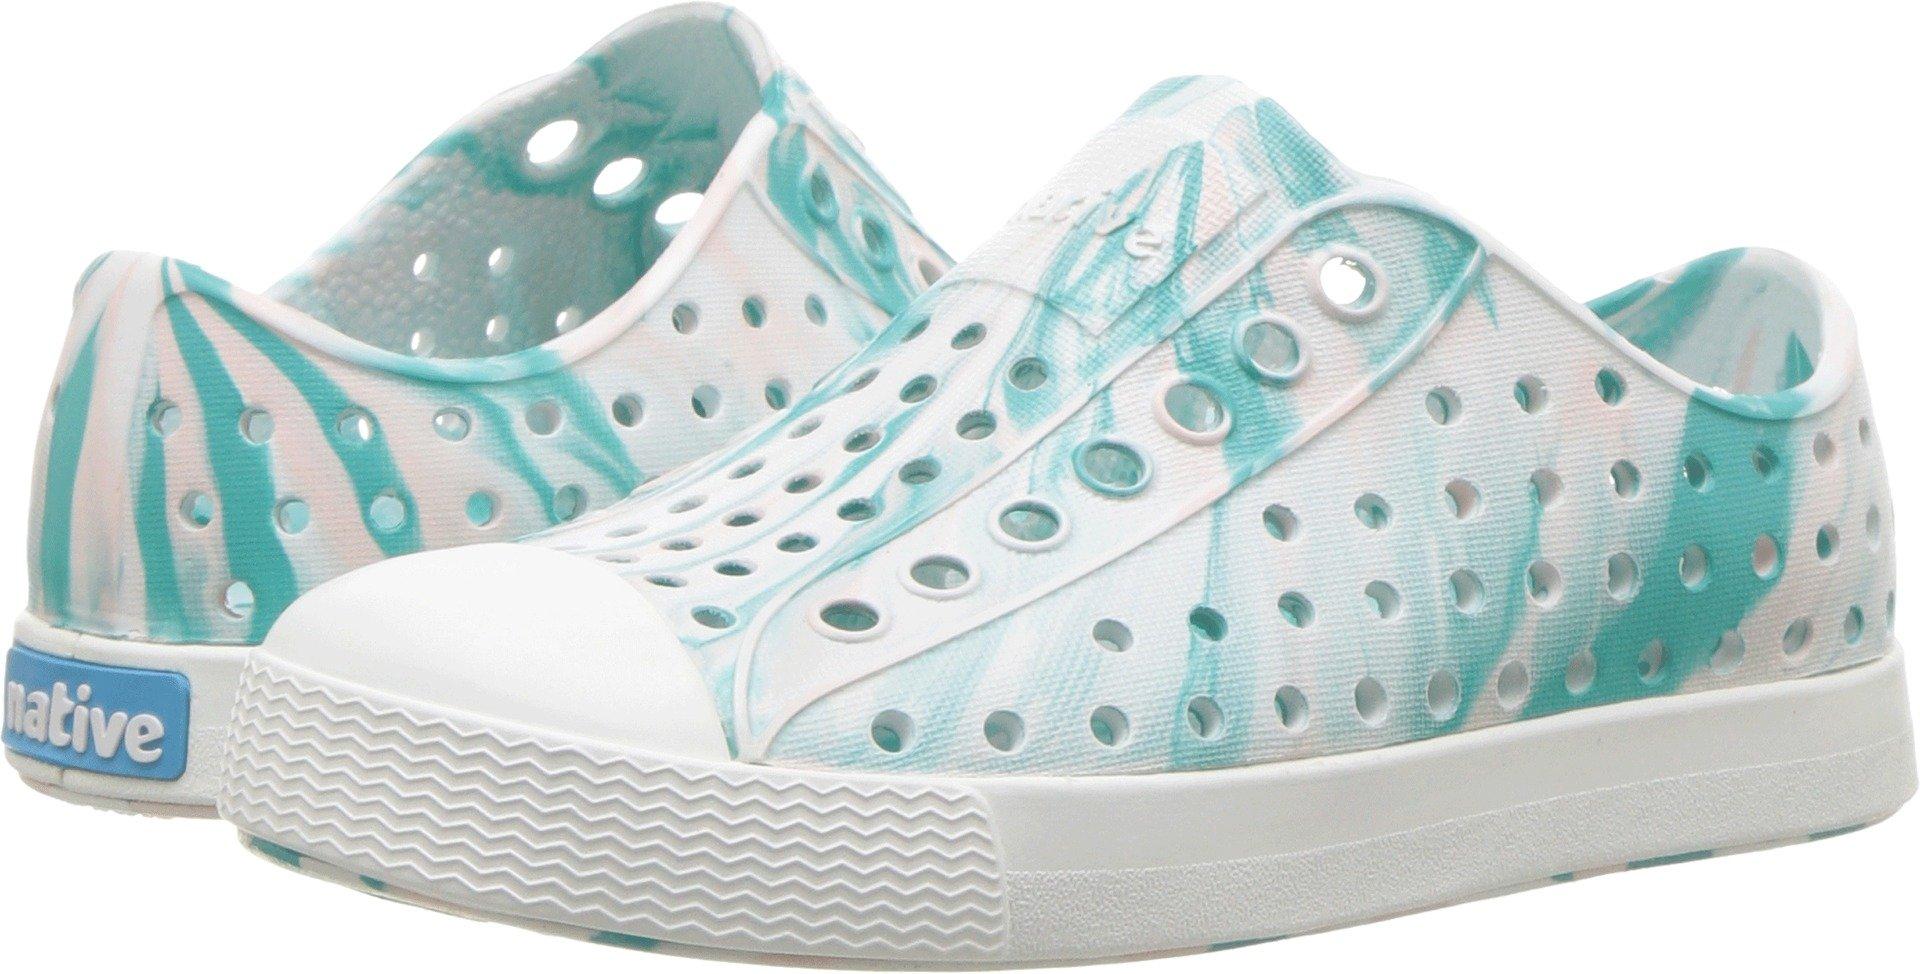 native Kids Baby Jefferson Child Sneaker, Glass Green/Shell White Marbled, 10 Medium US Toddler